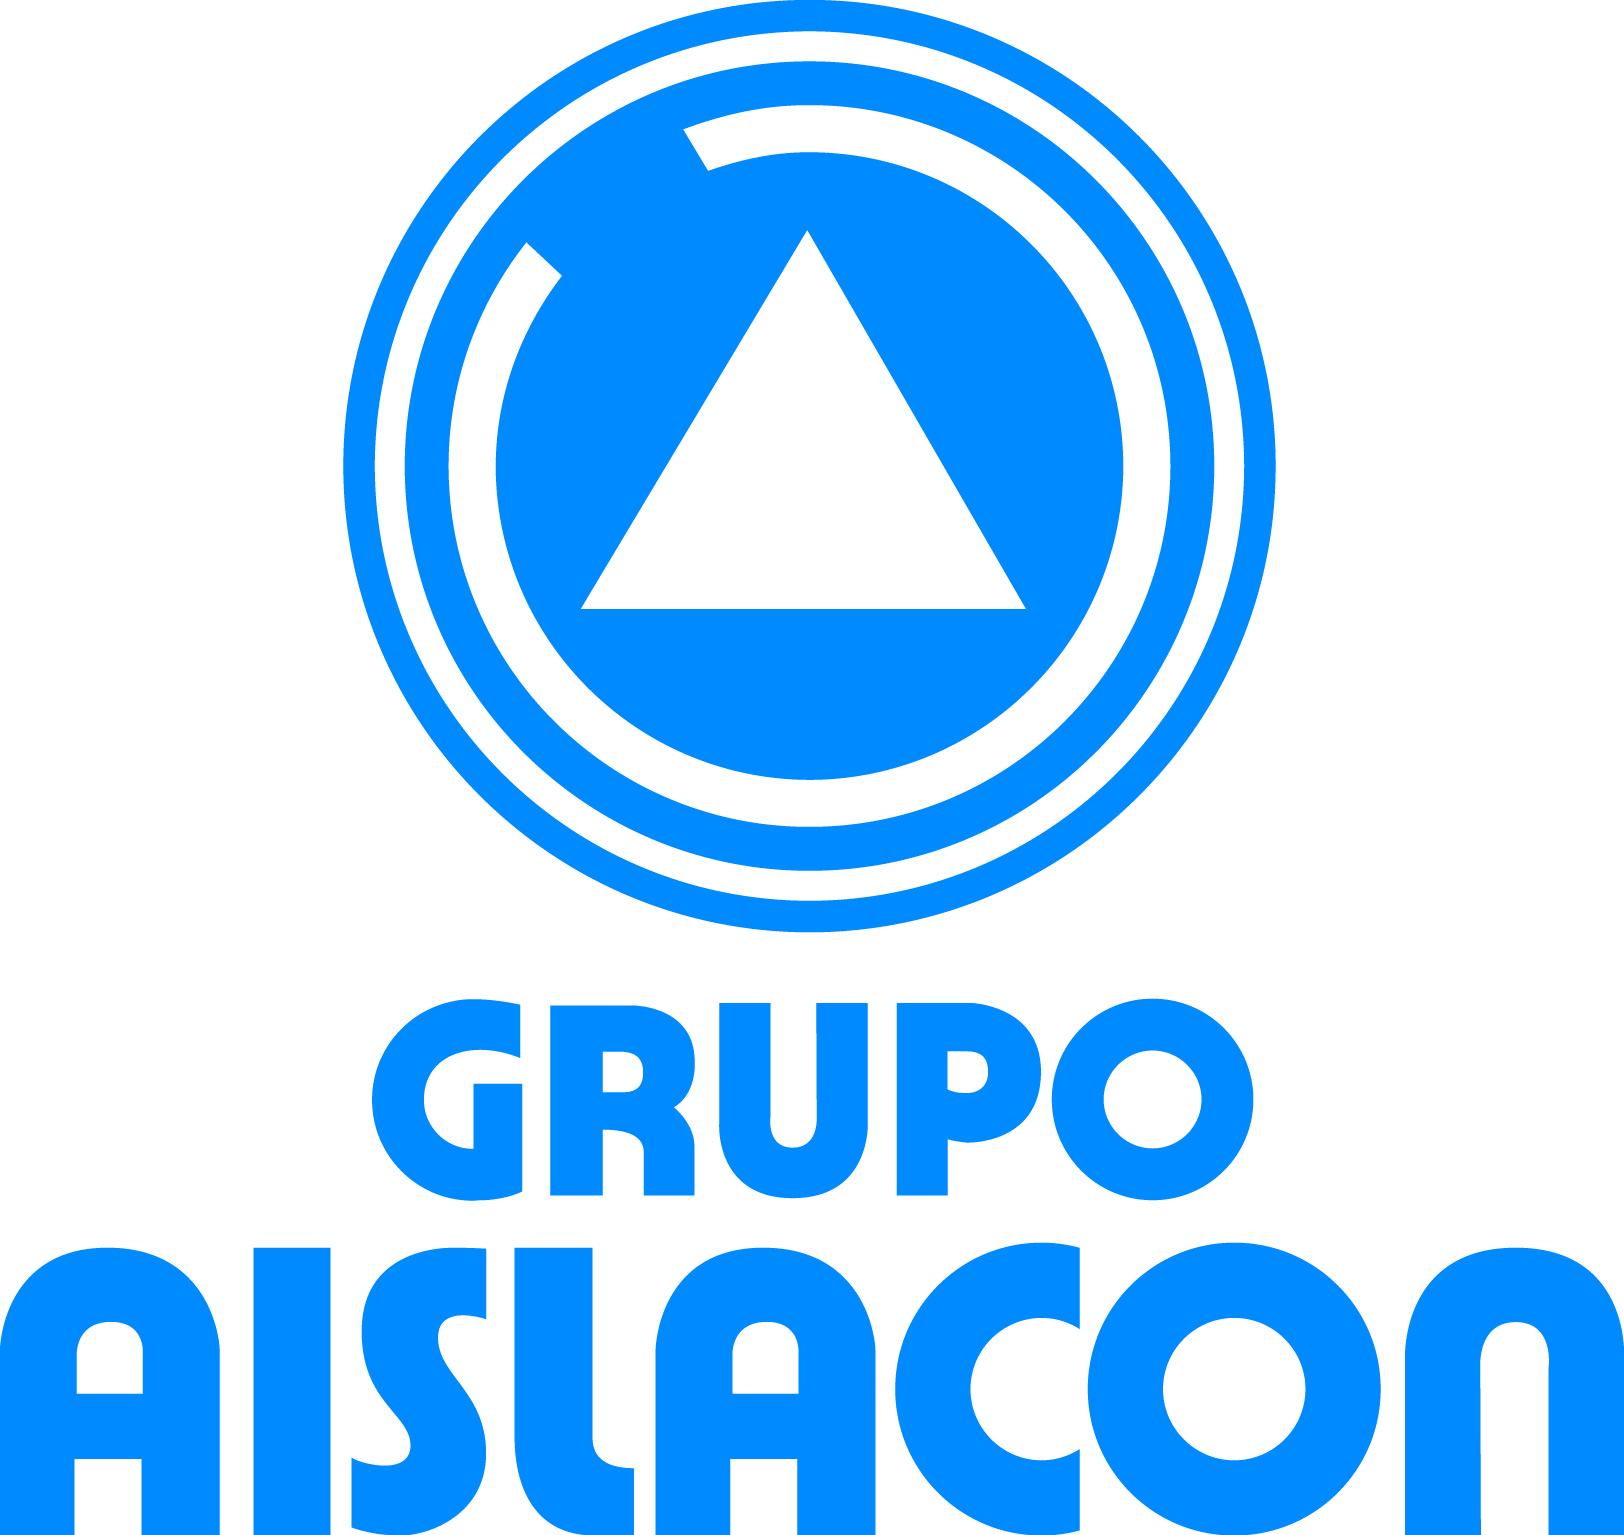 Grupo Aislocon